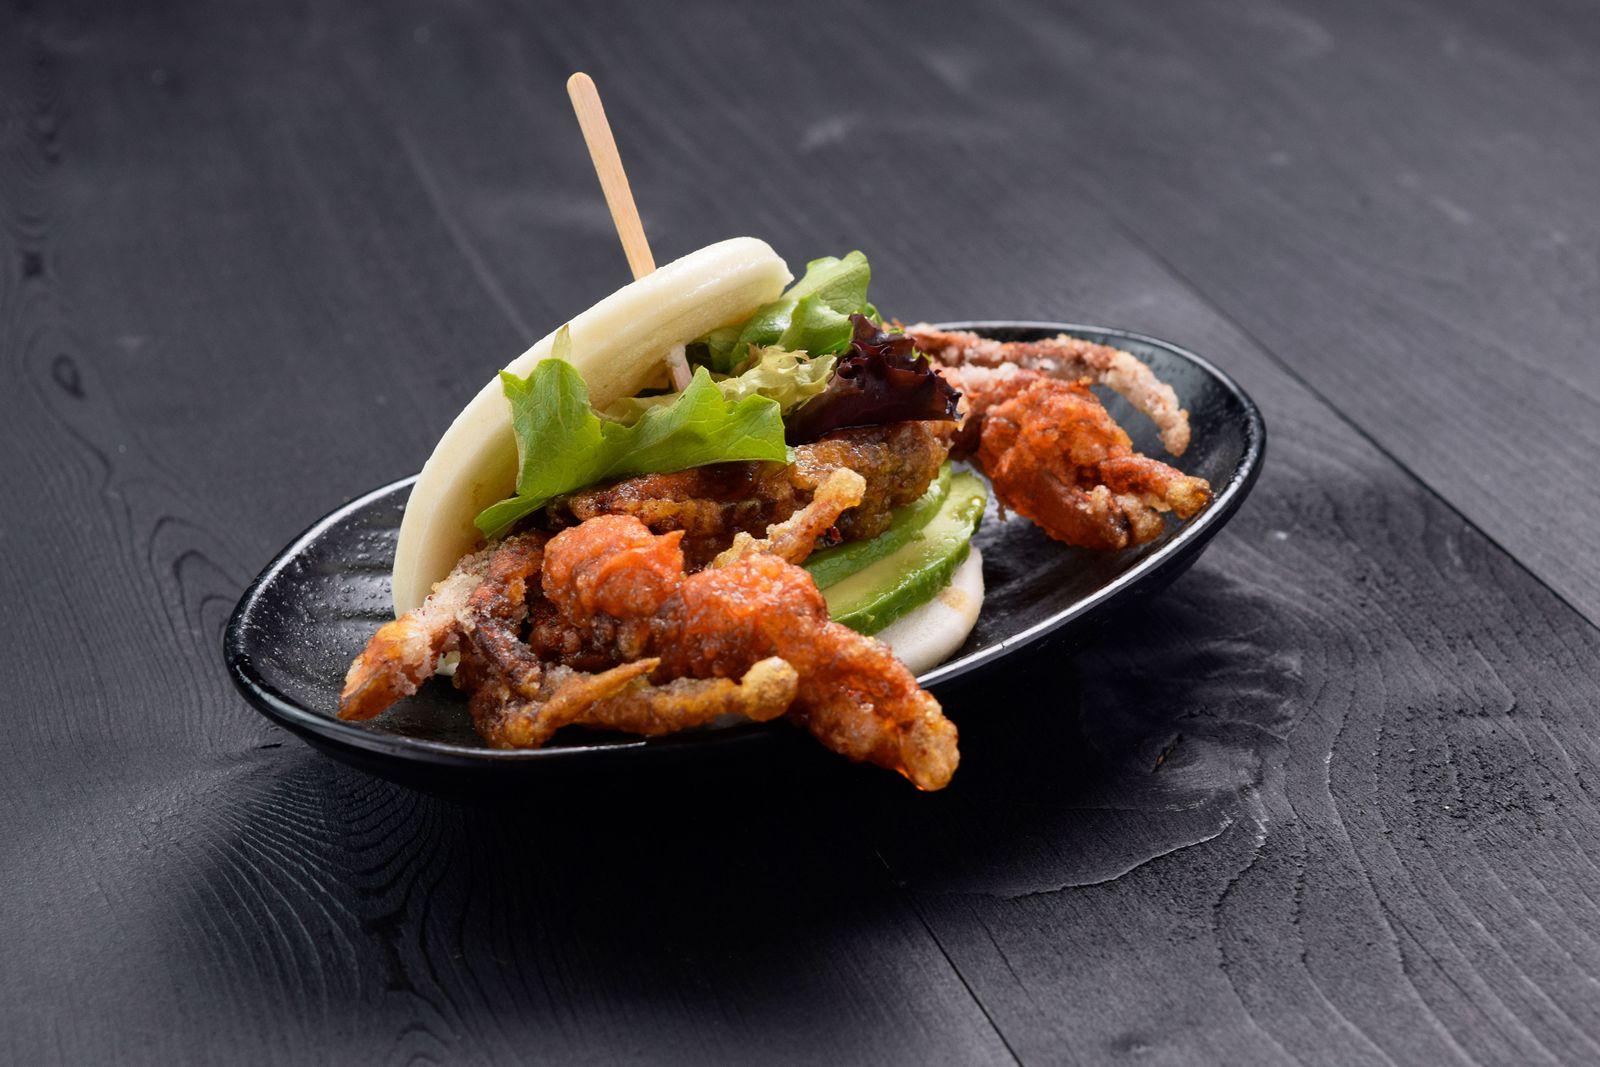 Enjoy the Flavors of Winter with JINYA Ramen Bar's New Chef's Specials Menu